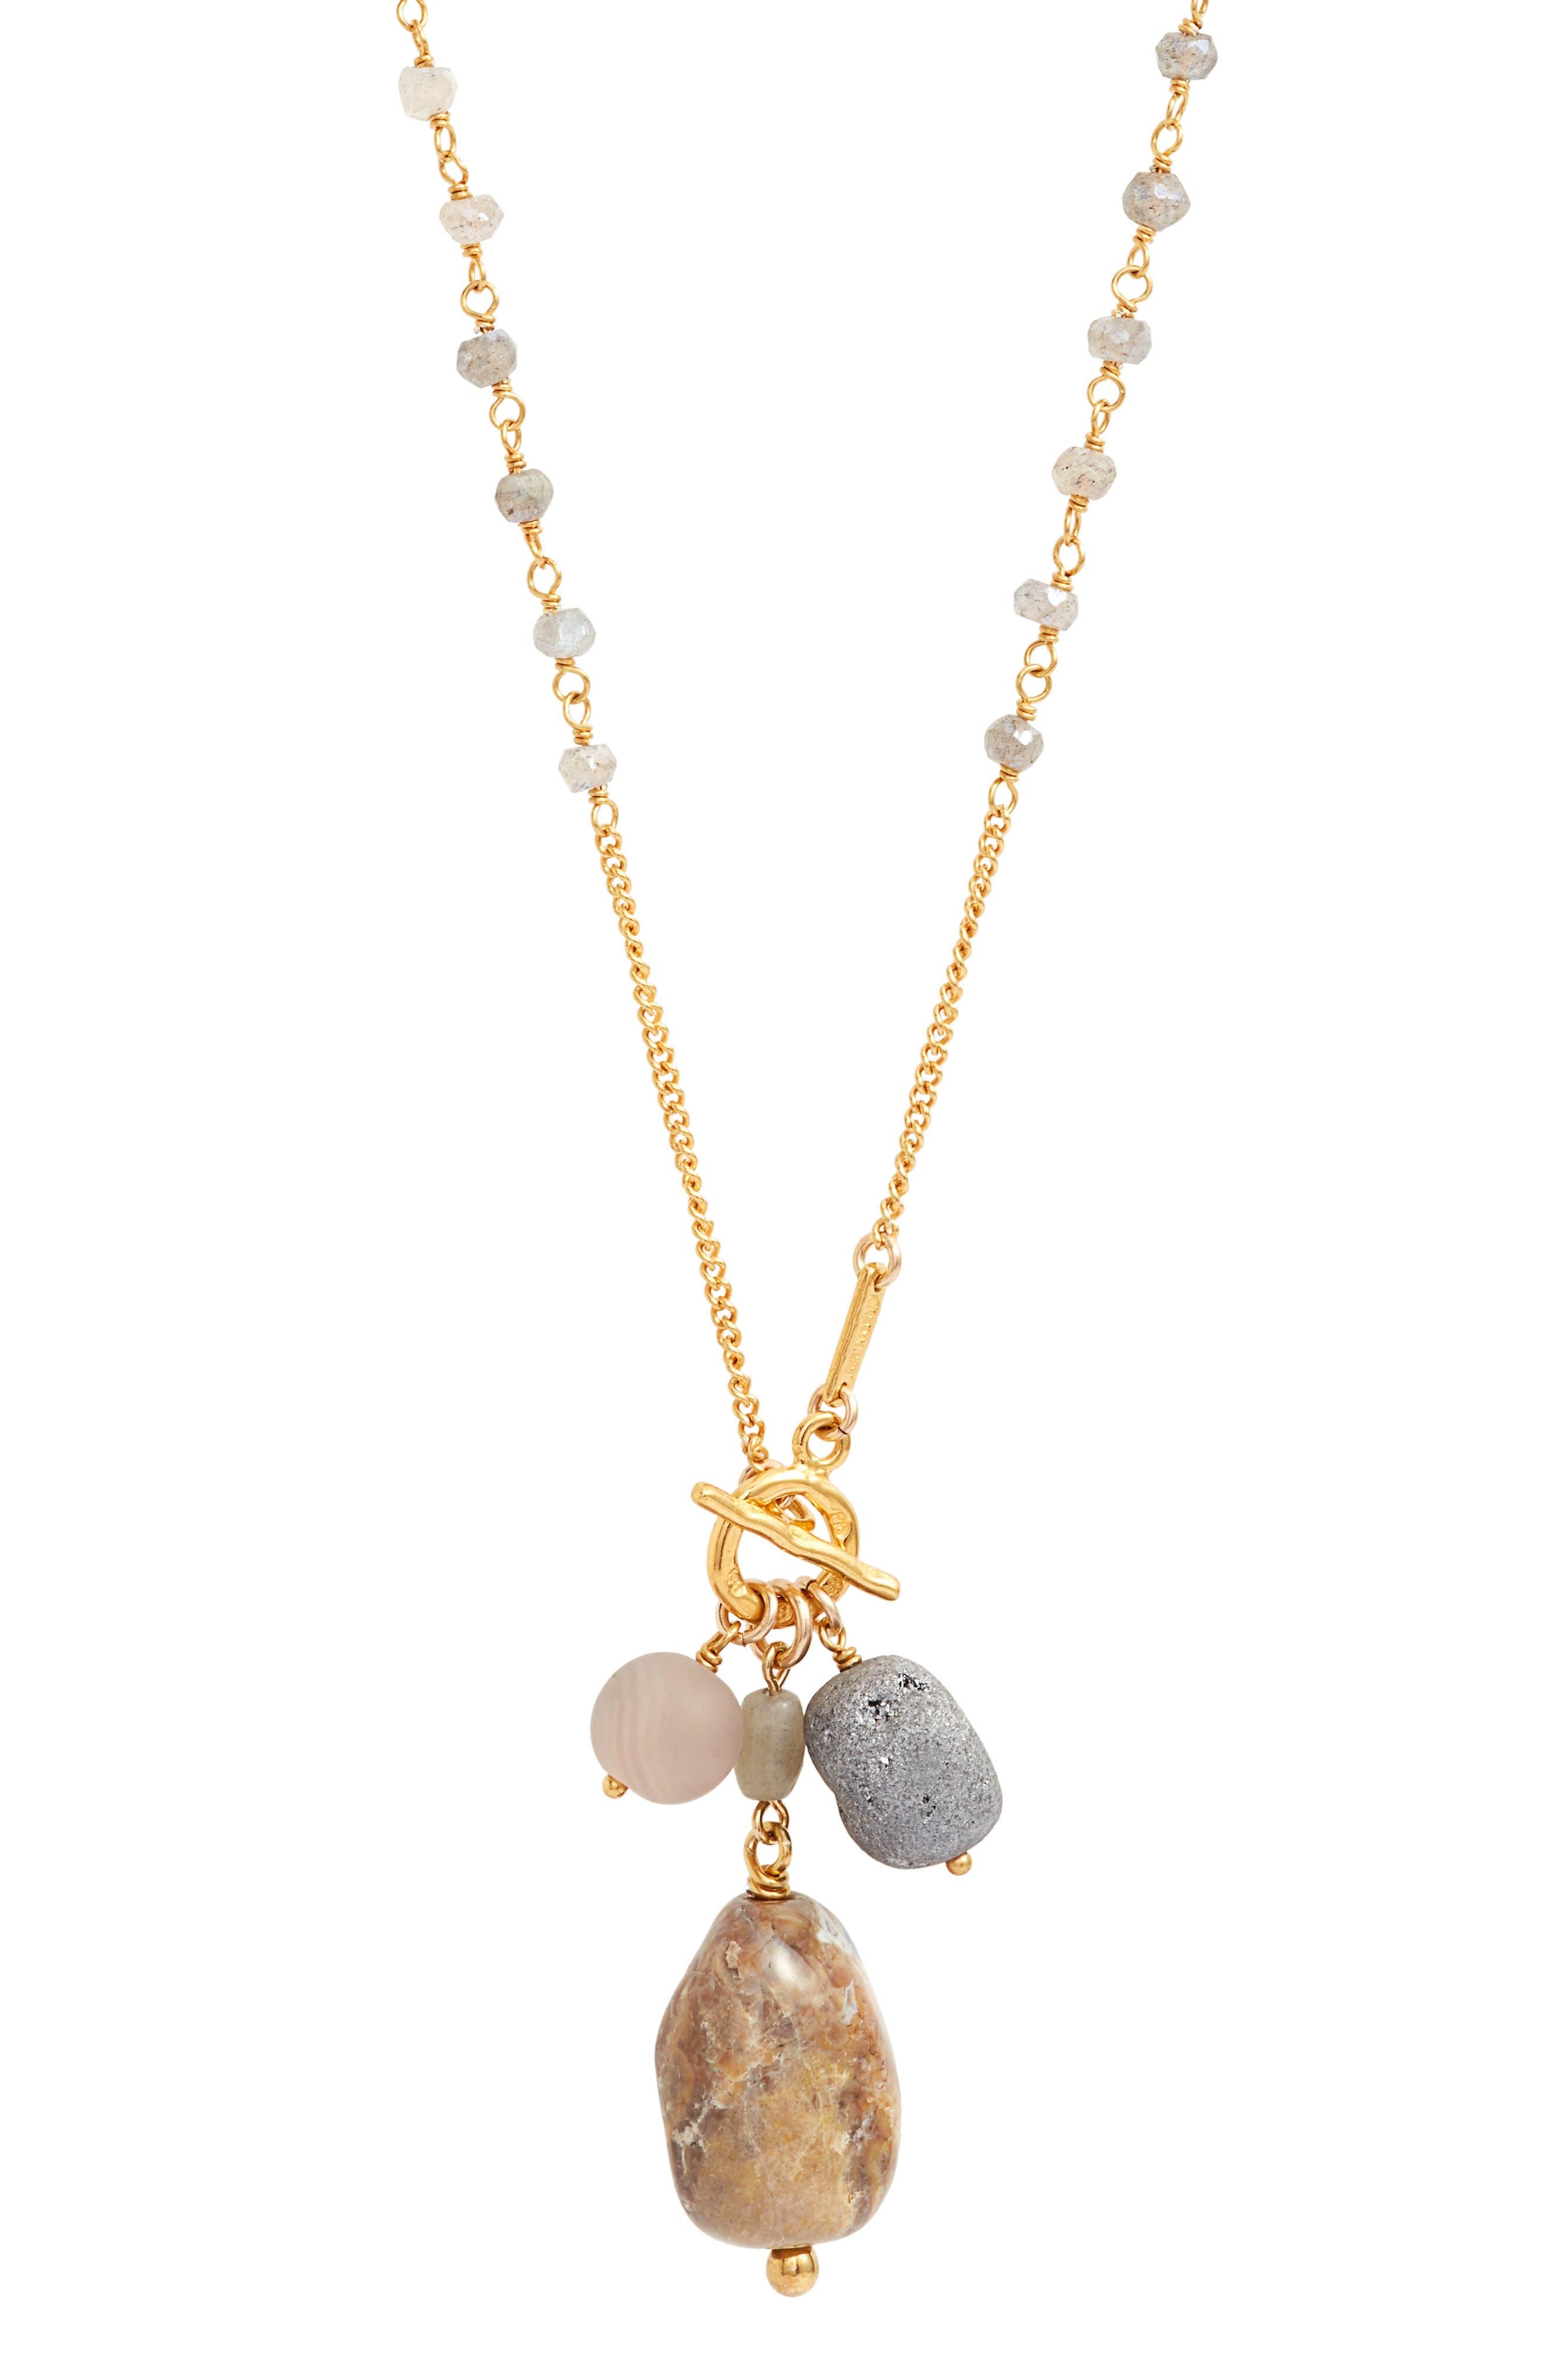 Mixed Stone Pendant Necklace,                             Alternate thumbnail 2, color,                             020